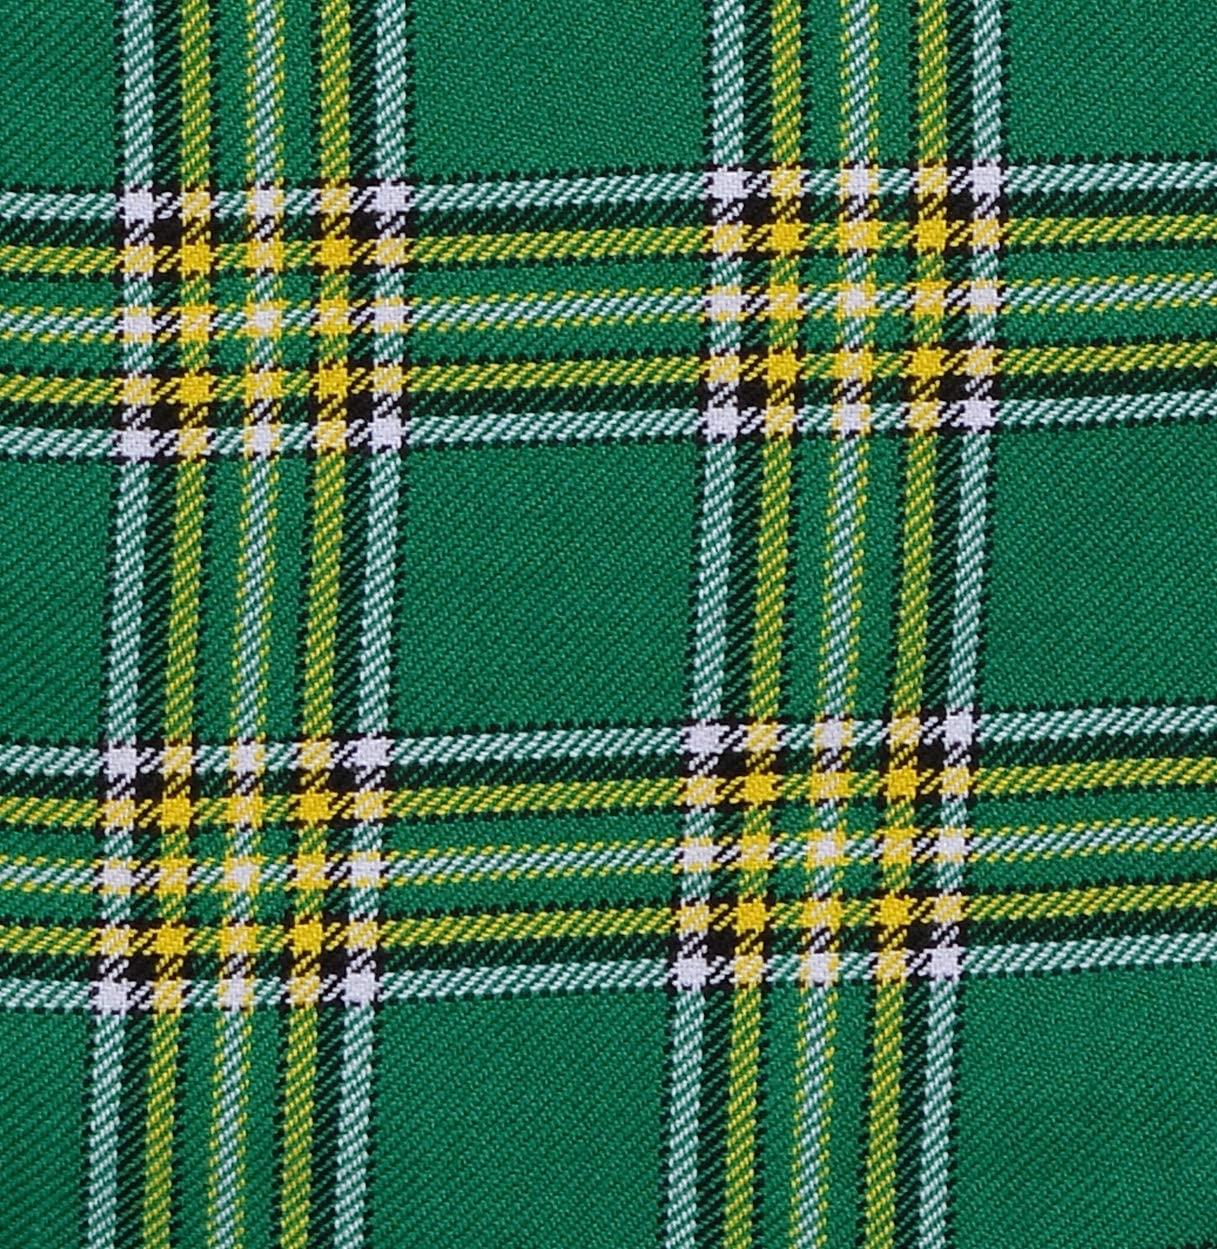 Scottish Acrylic Fabric Tartan Plaid by The Yard 13 Oz Weight (Irish Heritage, 1 Yard)